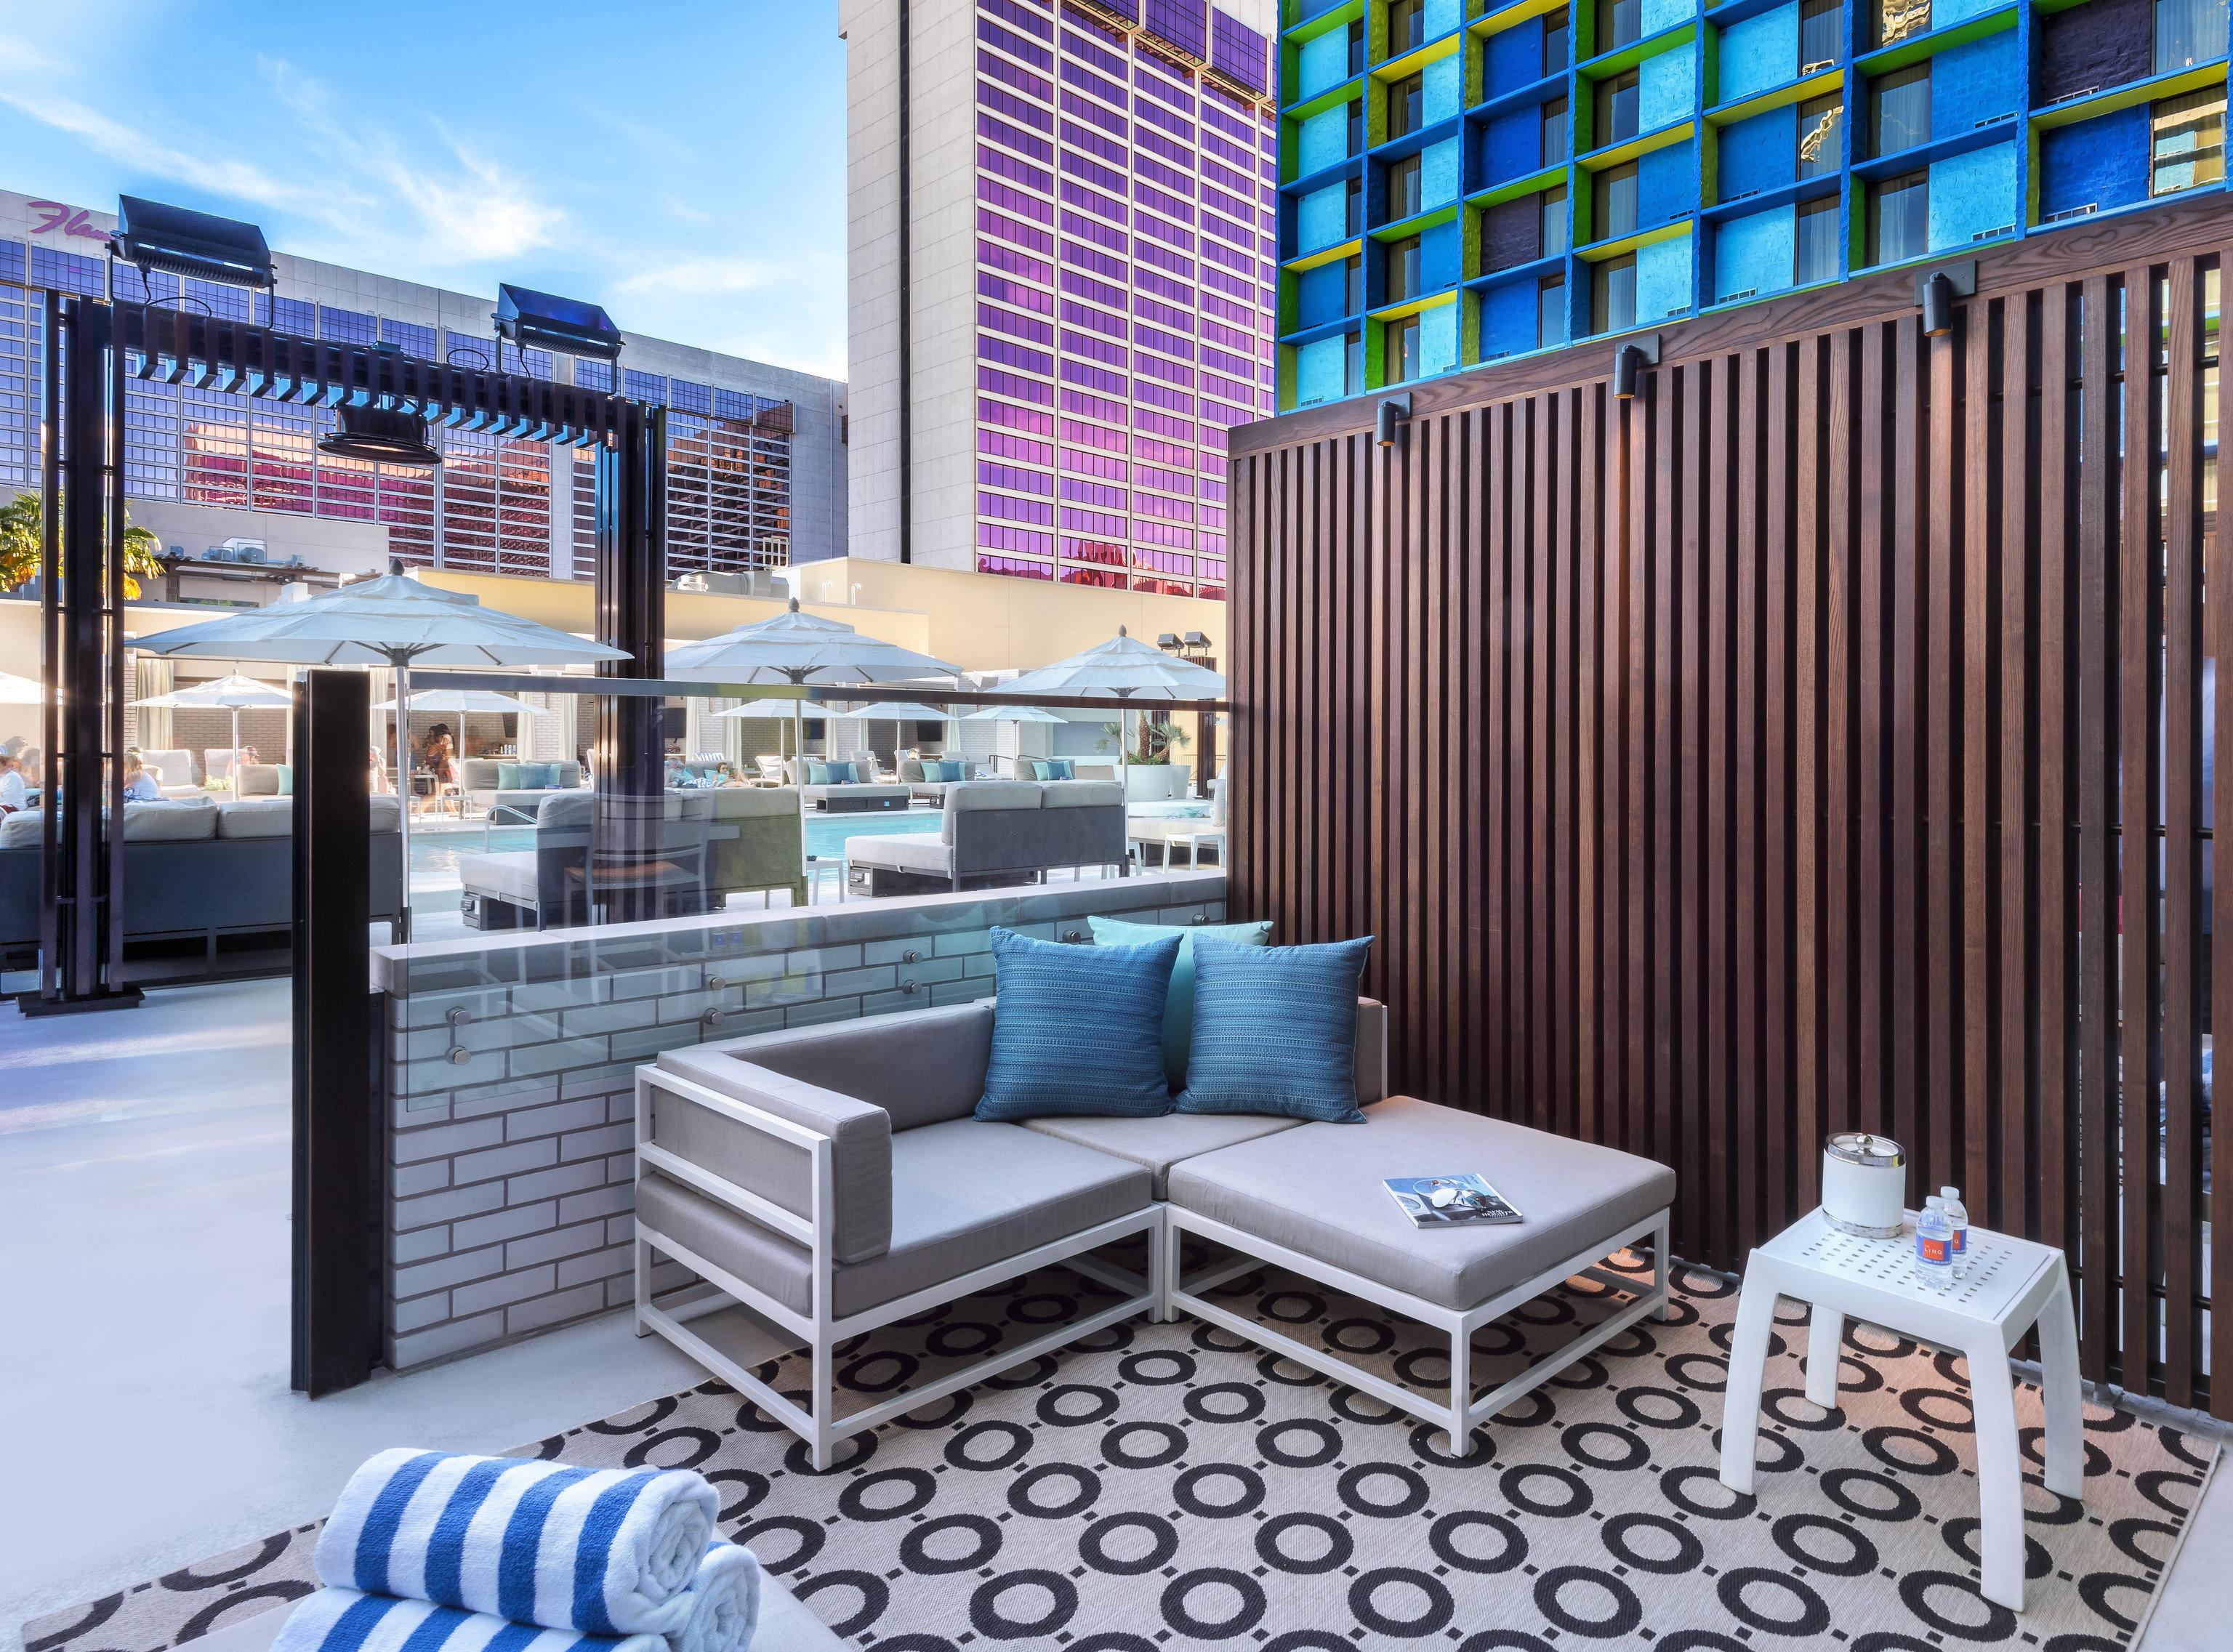 property condominium home outdoor structure